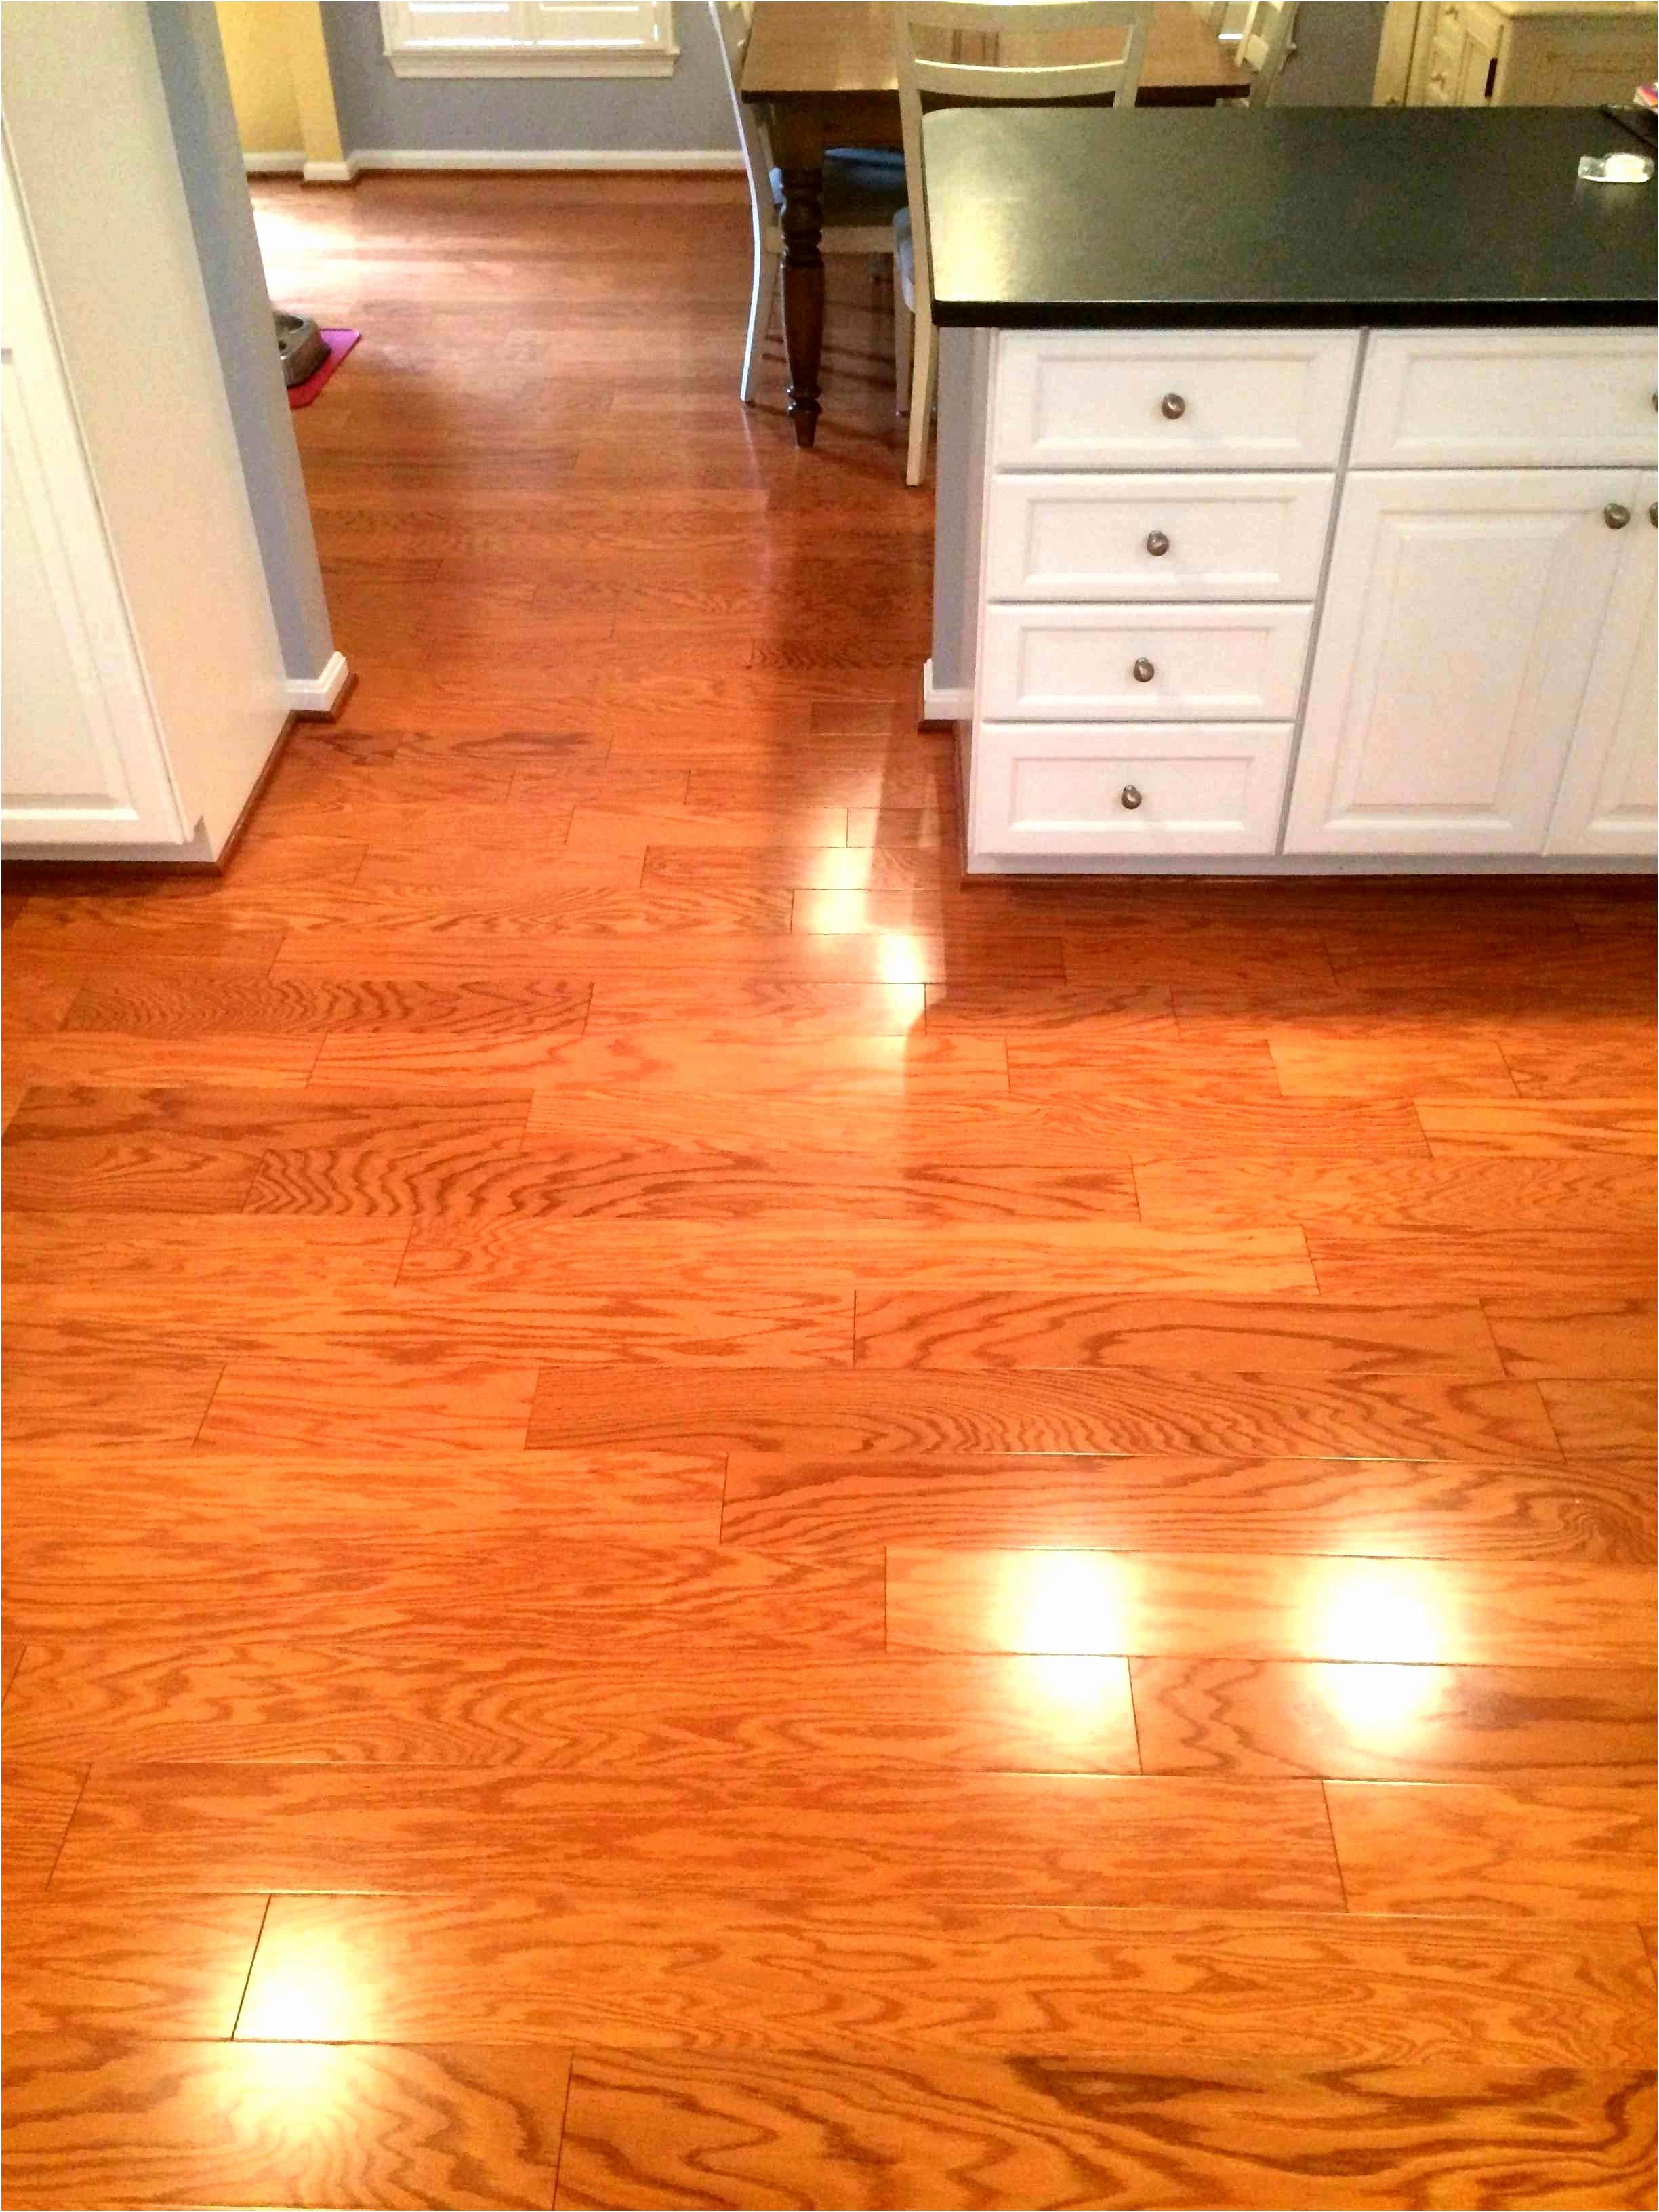 How to Repair Water Damaged Hardwood Floors Of 26 Unique Grey Hardwood Floors Photos Flooring Design Ideas Throughout Gallery Of 26 Grey Hardwood Floors